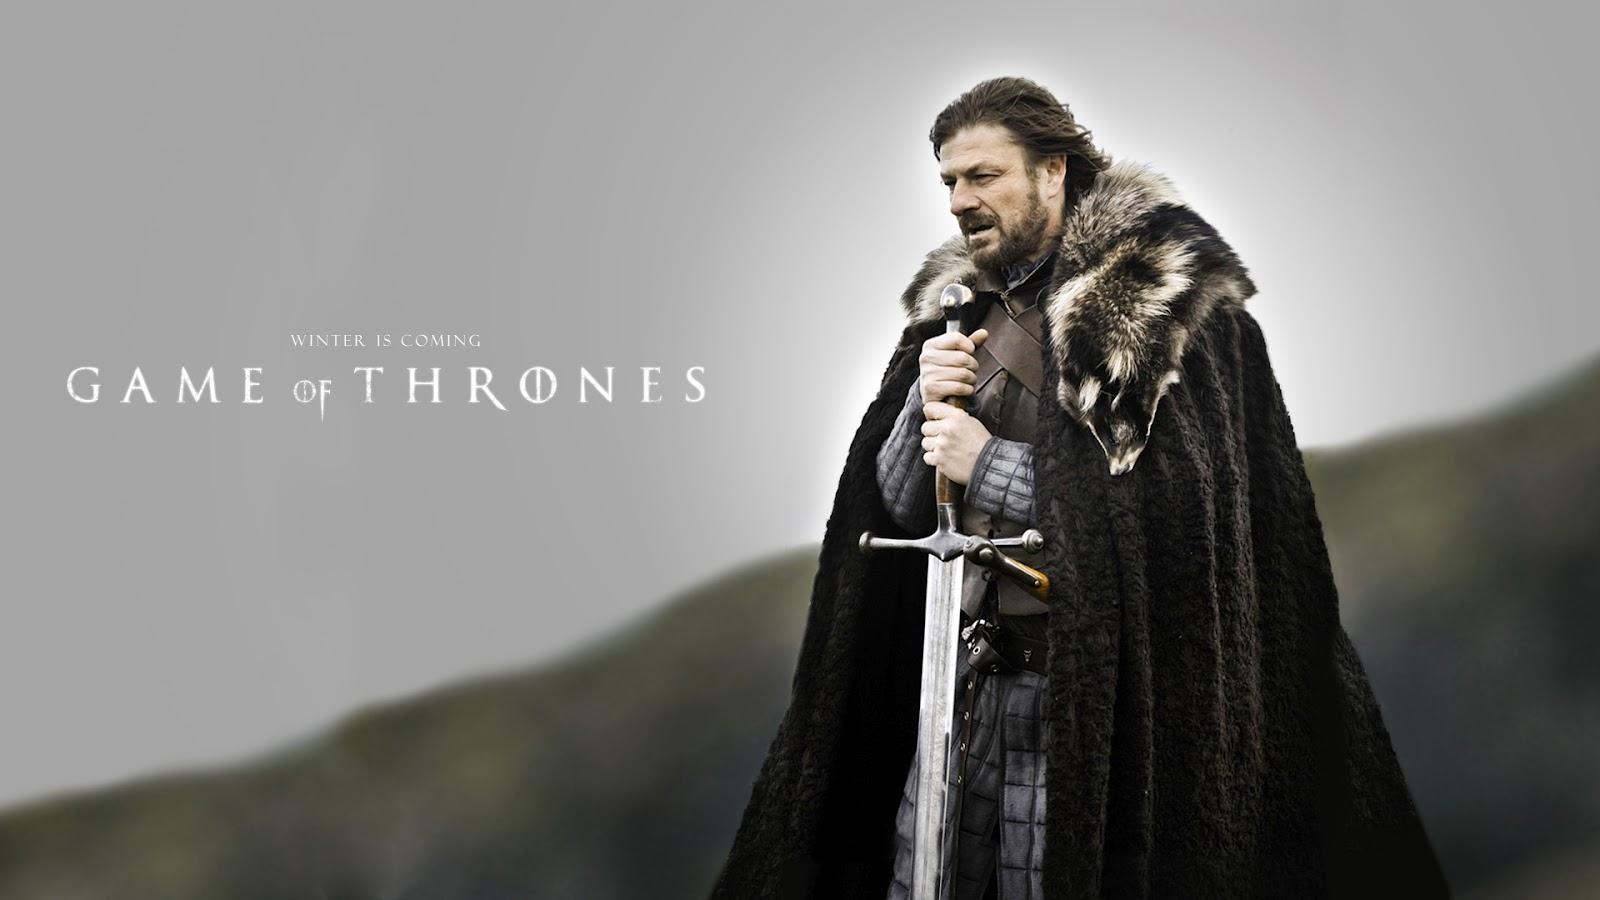 Eddard 'Ned' Stark Game of Thrones High Res Desktop Background